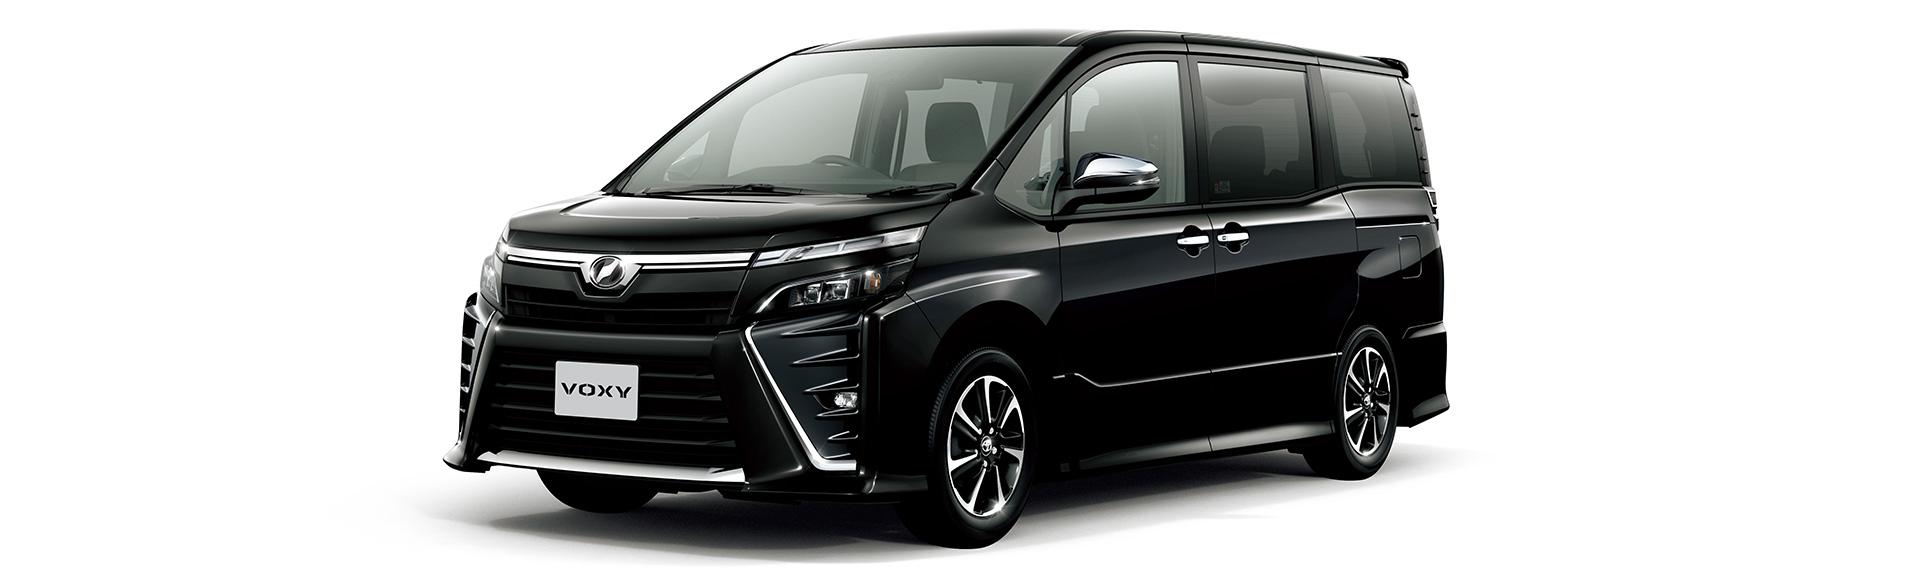 Kelebihan Kekurangan Toyota Voxy Harga